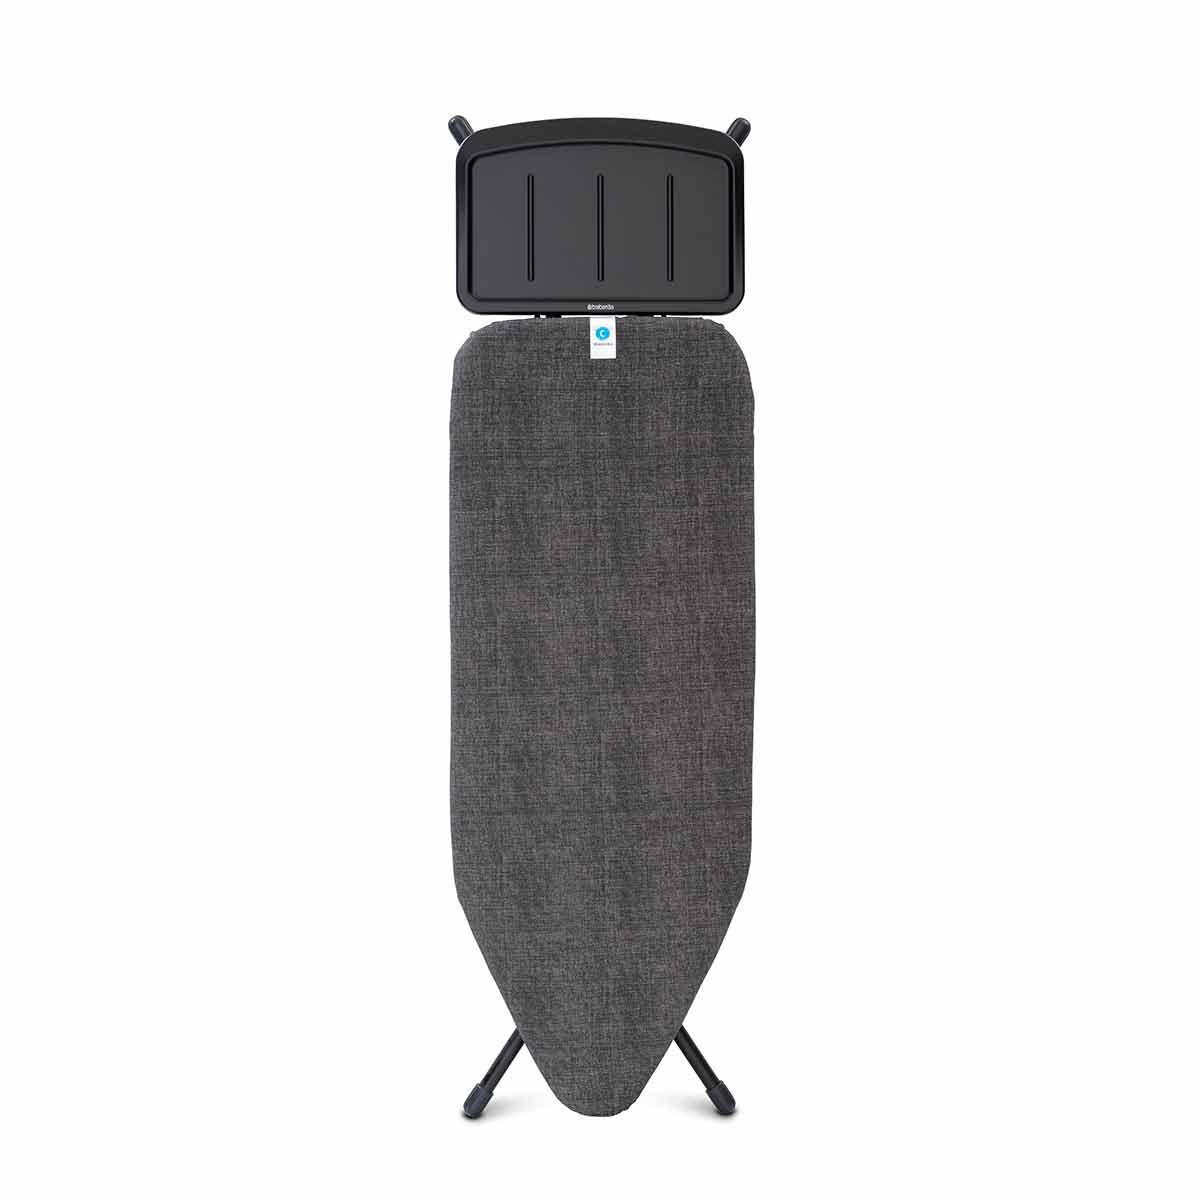 Brabantia Size C Ironing Board with Steam Unit Holder 124x45cm, BlackDenim